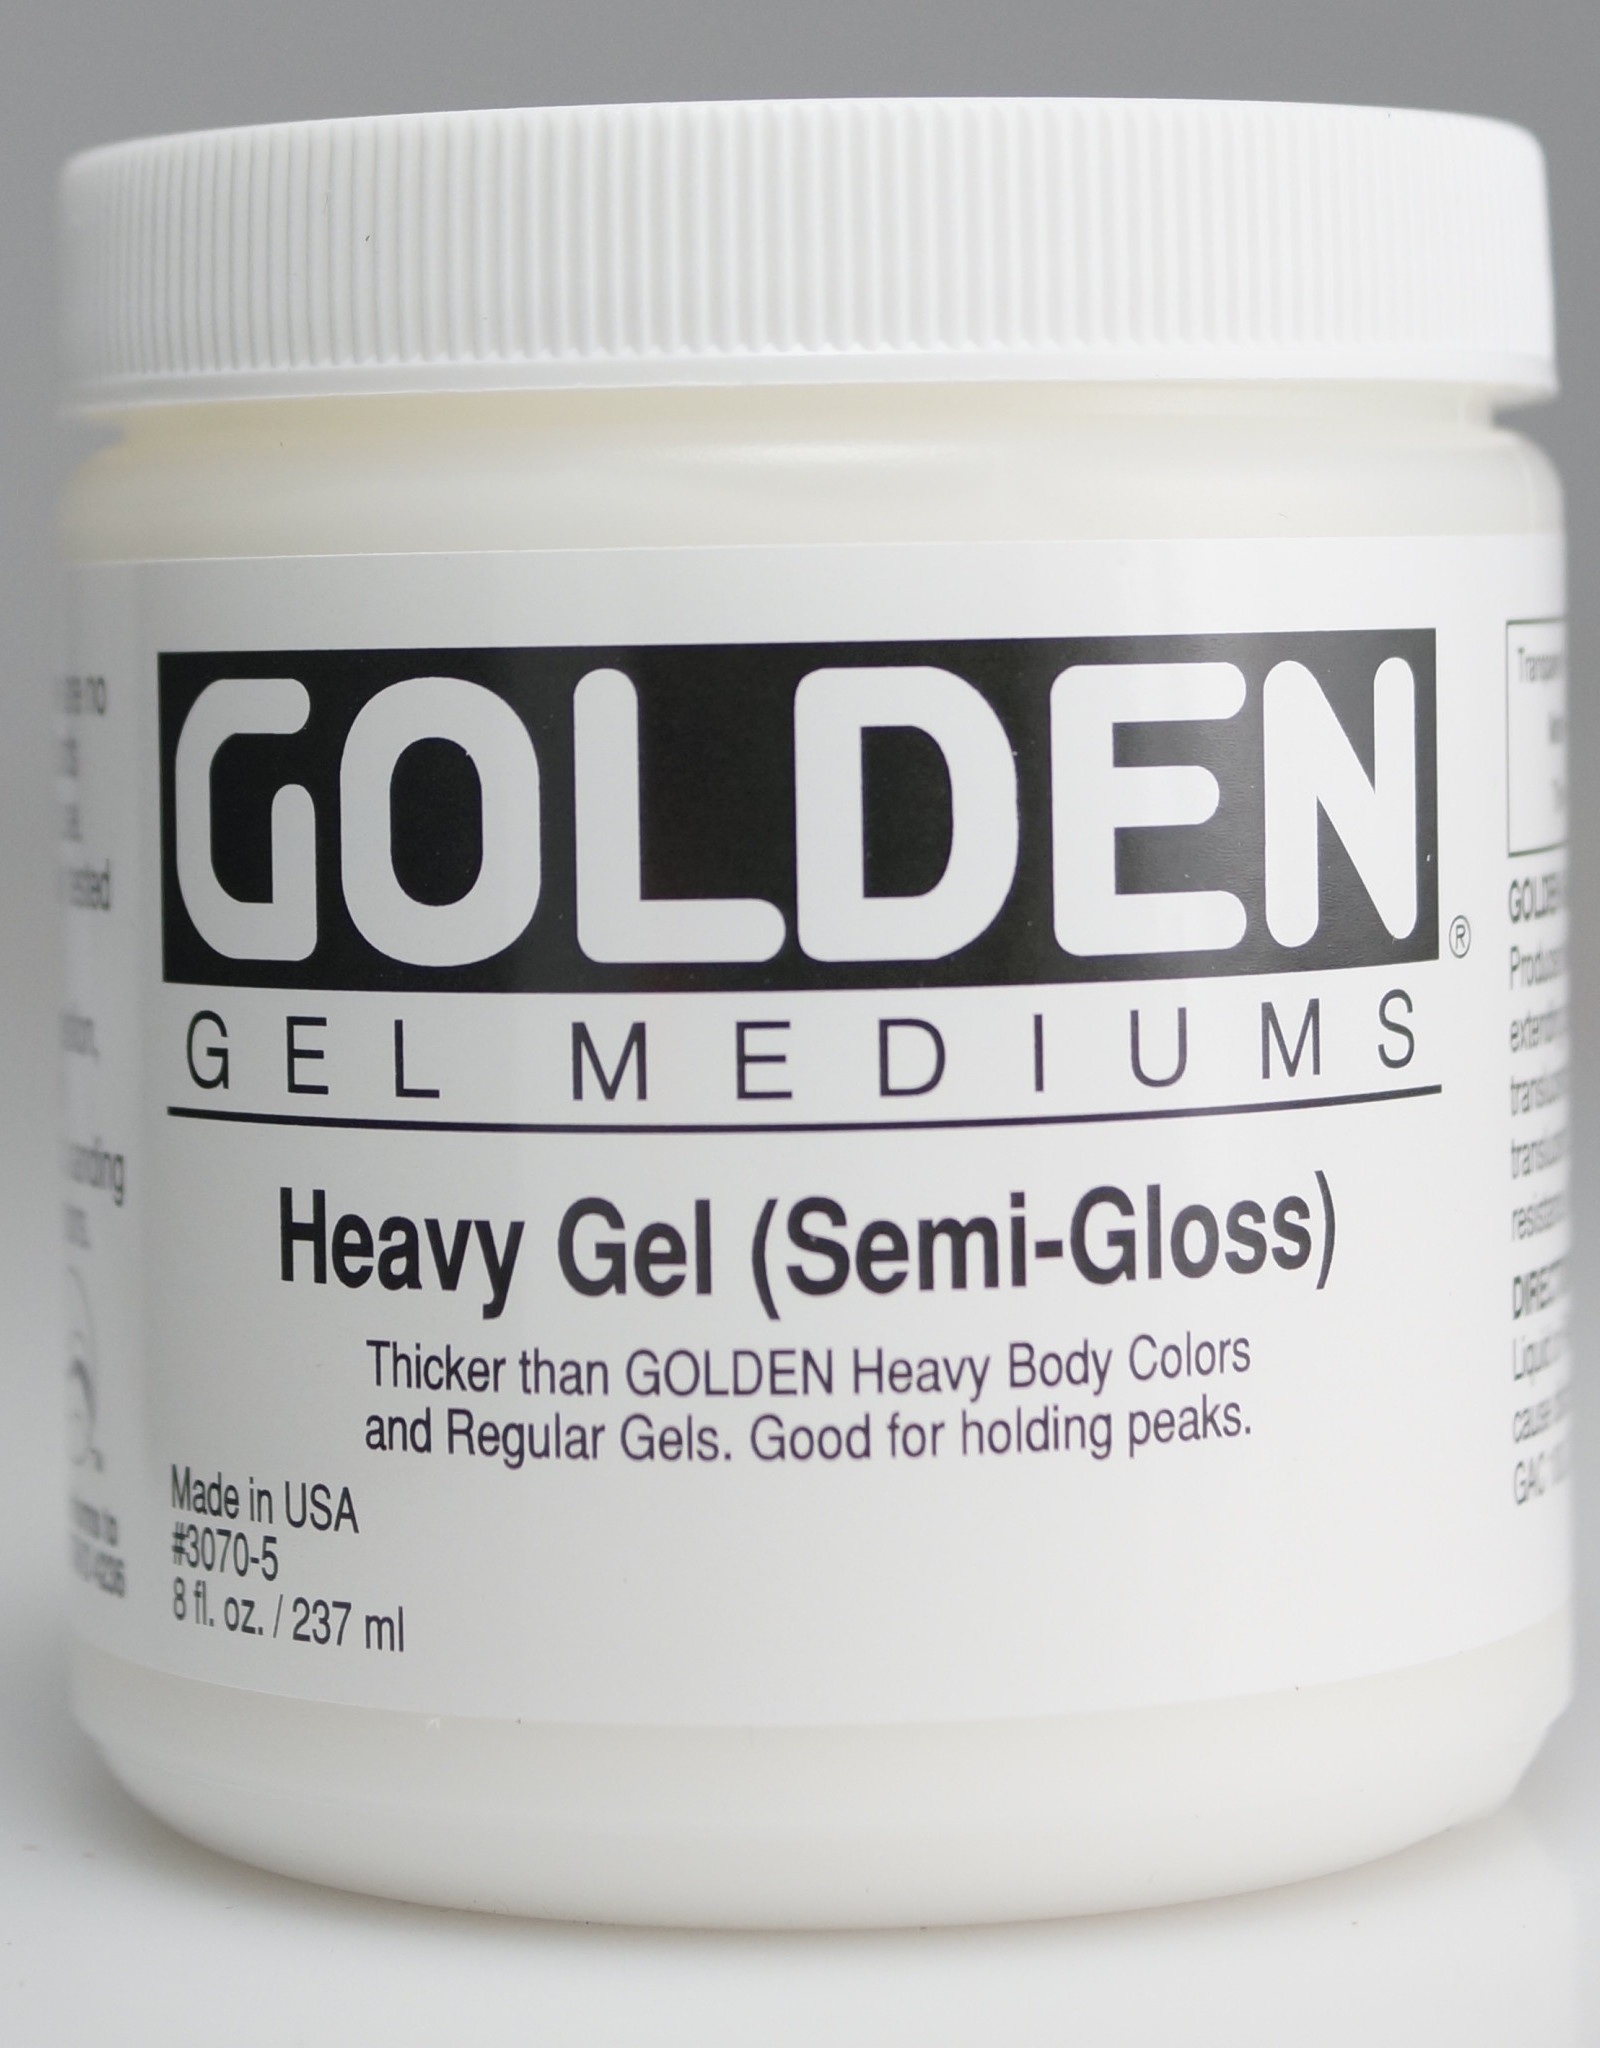 Golden, Heavy Gel Medium, Semi-Gloss, 8oz Jar